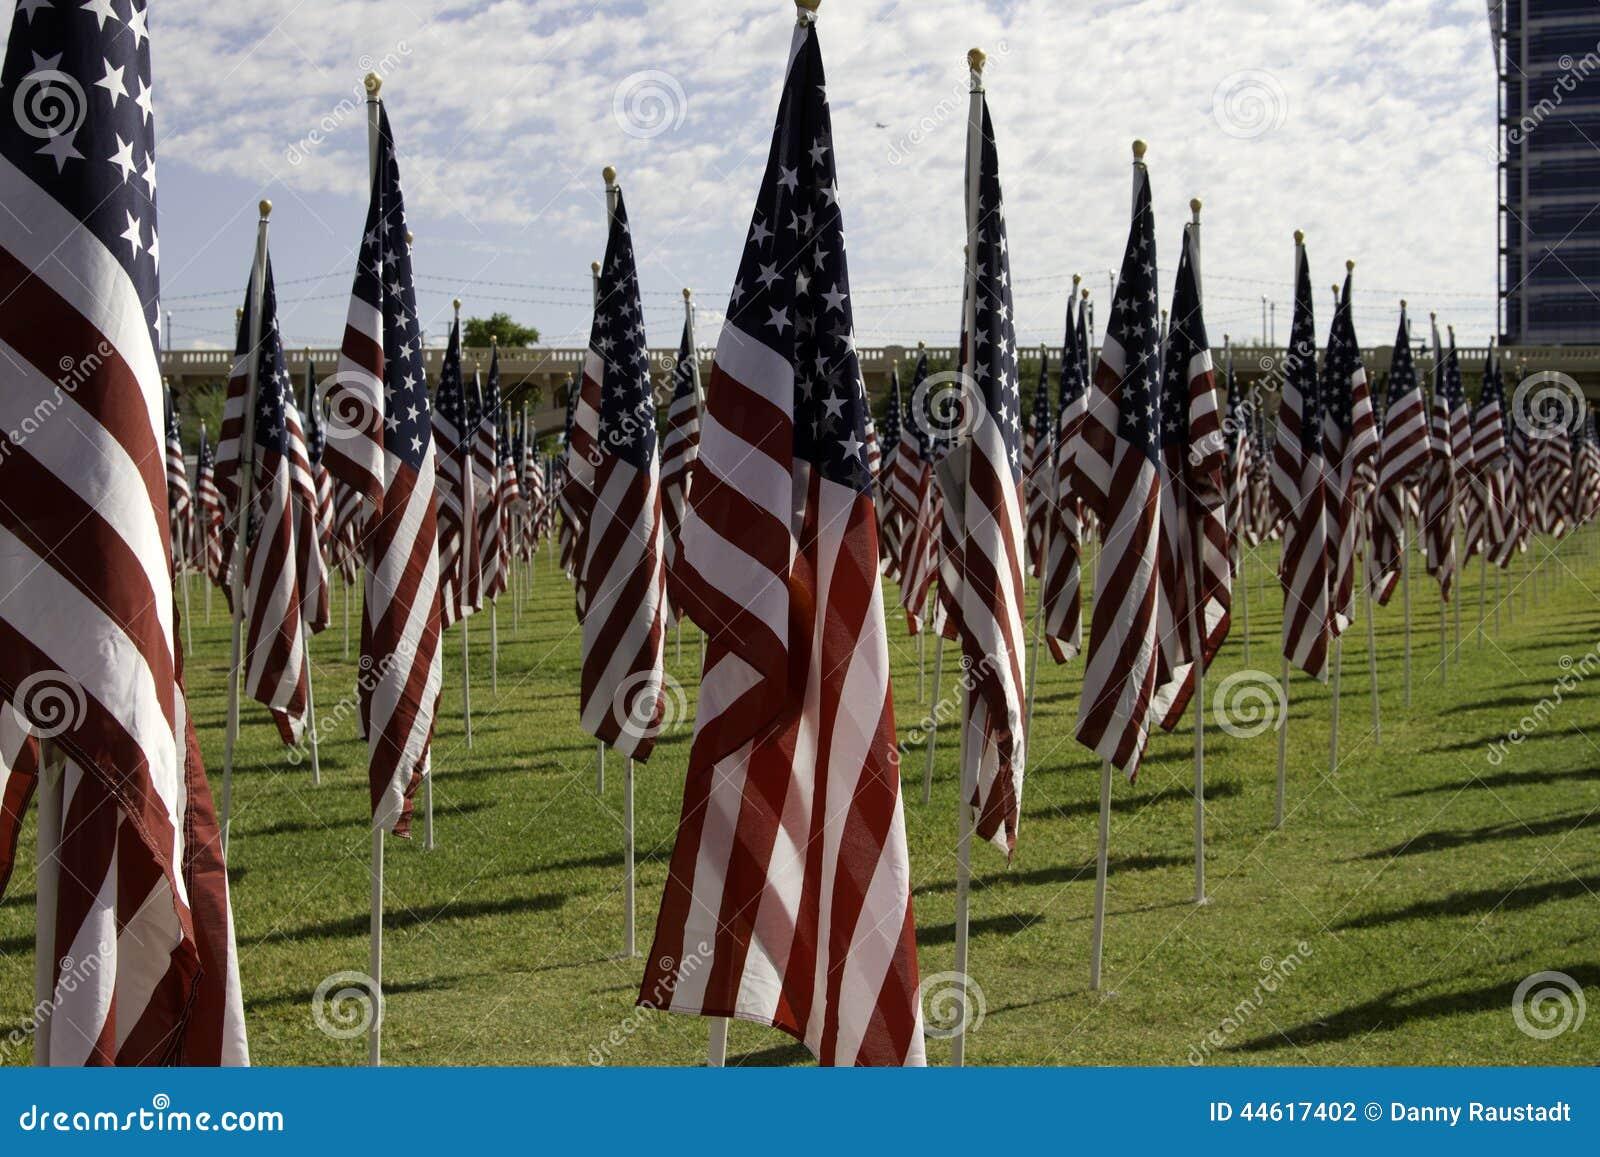 911 bandeiras americanas do campo cura memorável